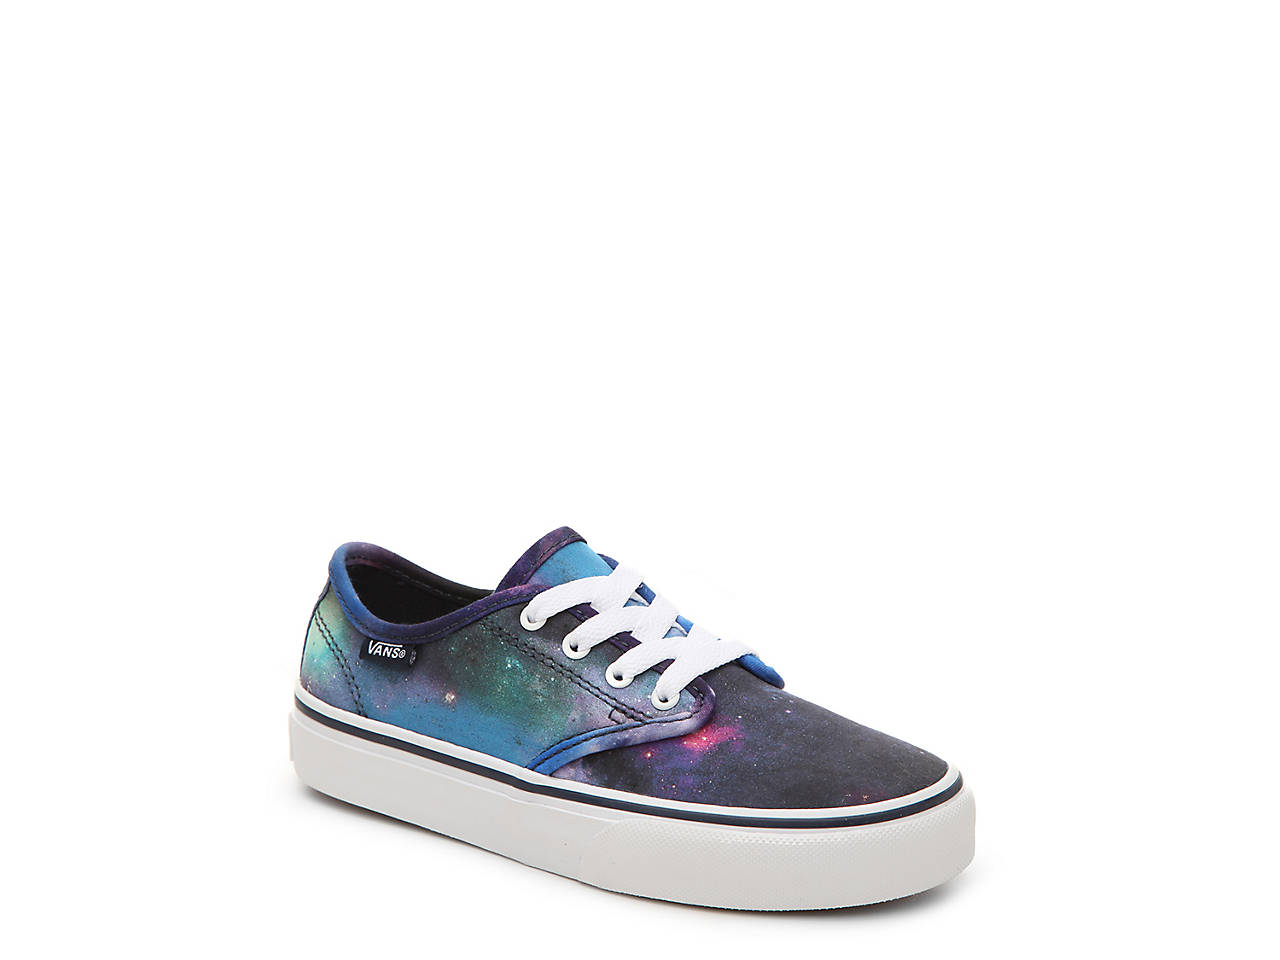 11895ff4c395 Vans Camden Cosmic Galaxy Toddler   Youth Sneaker Kids Shoes